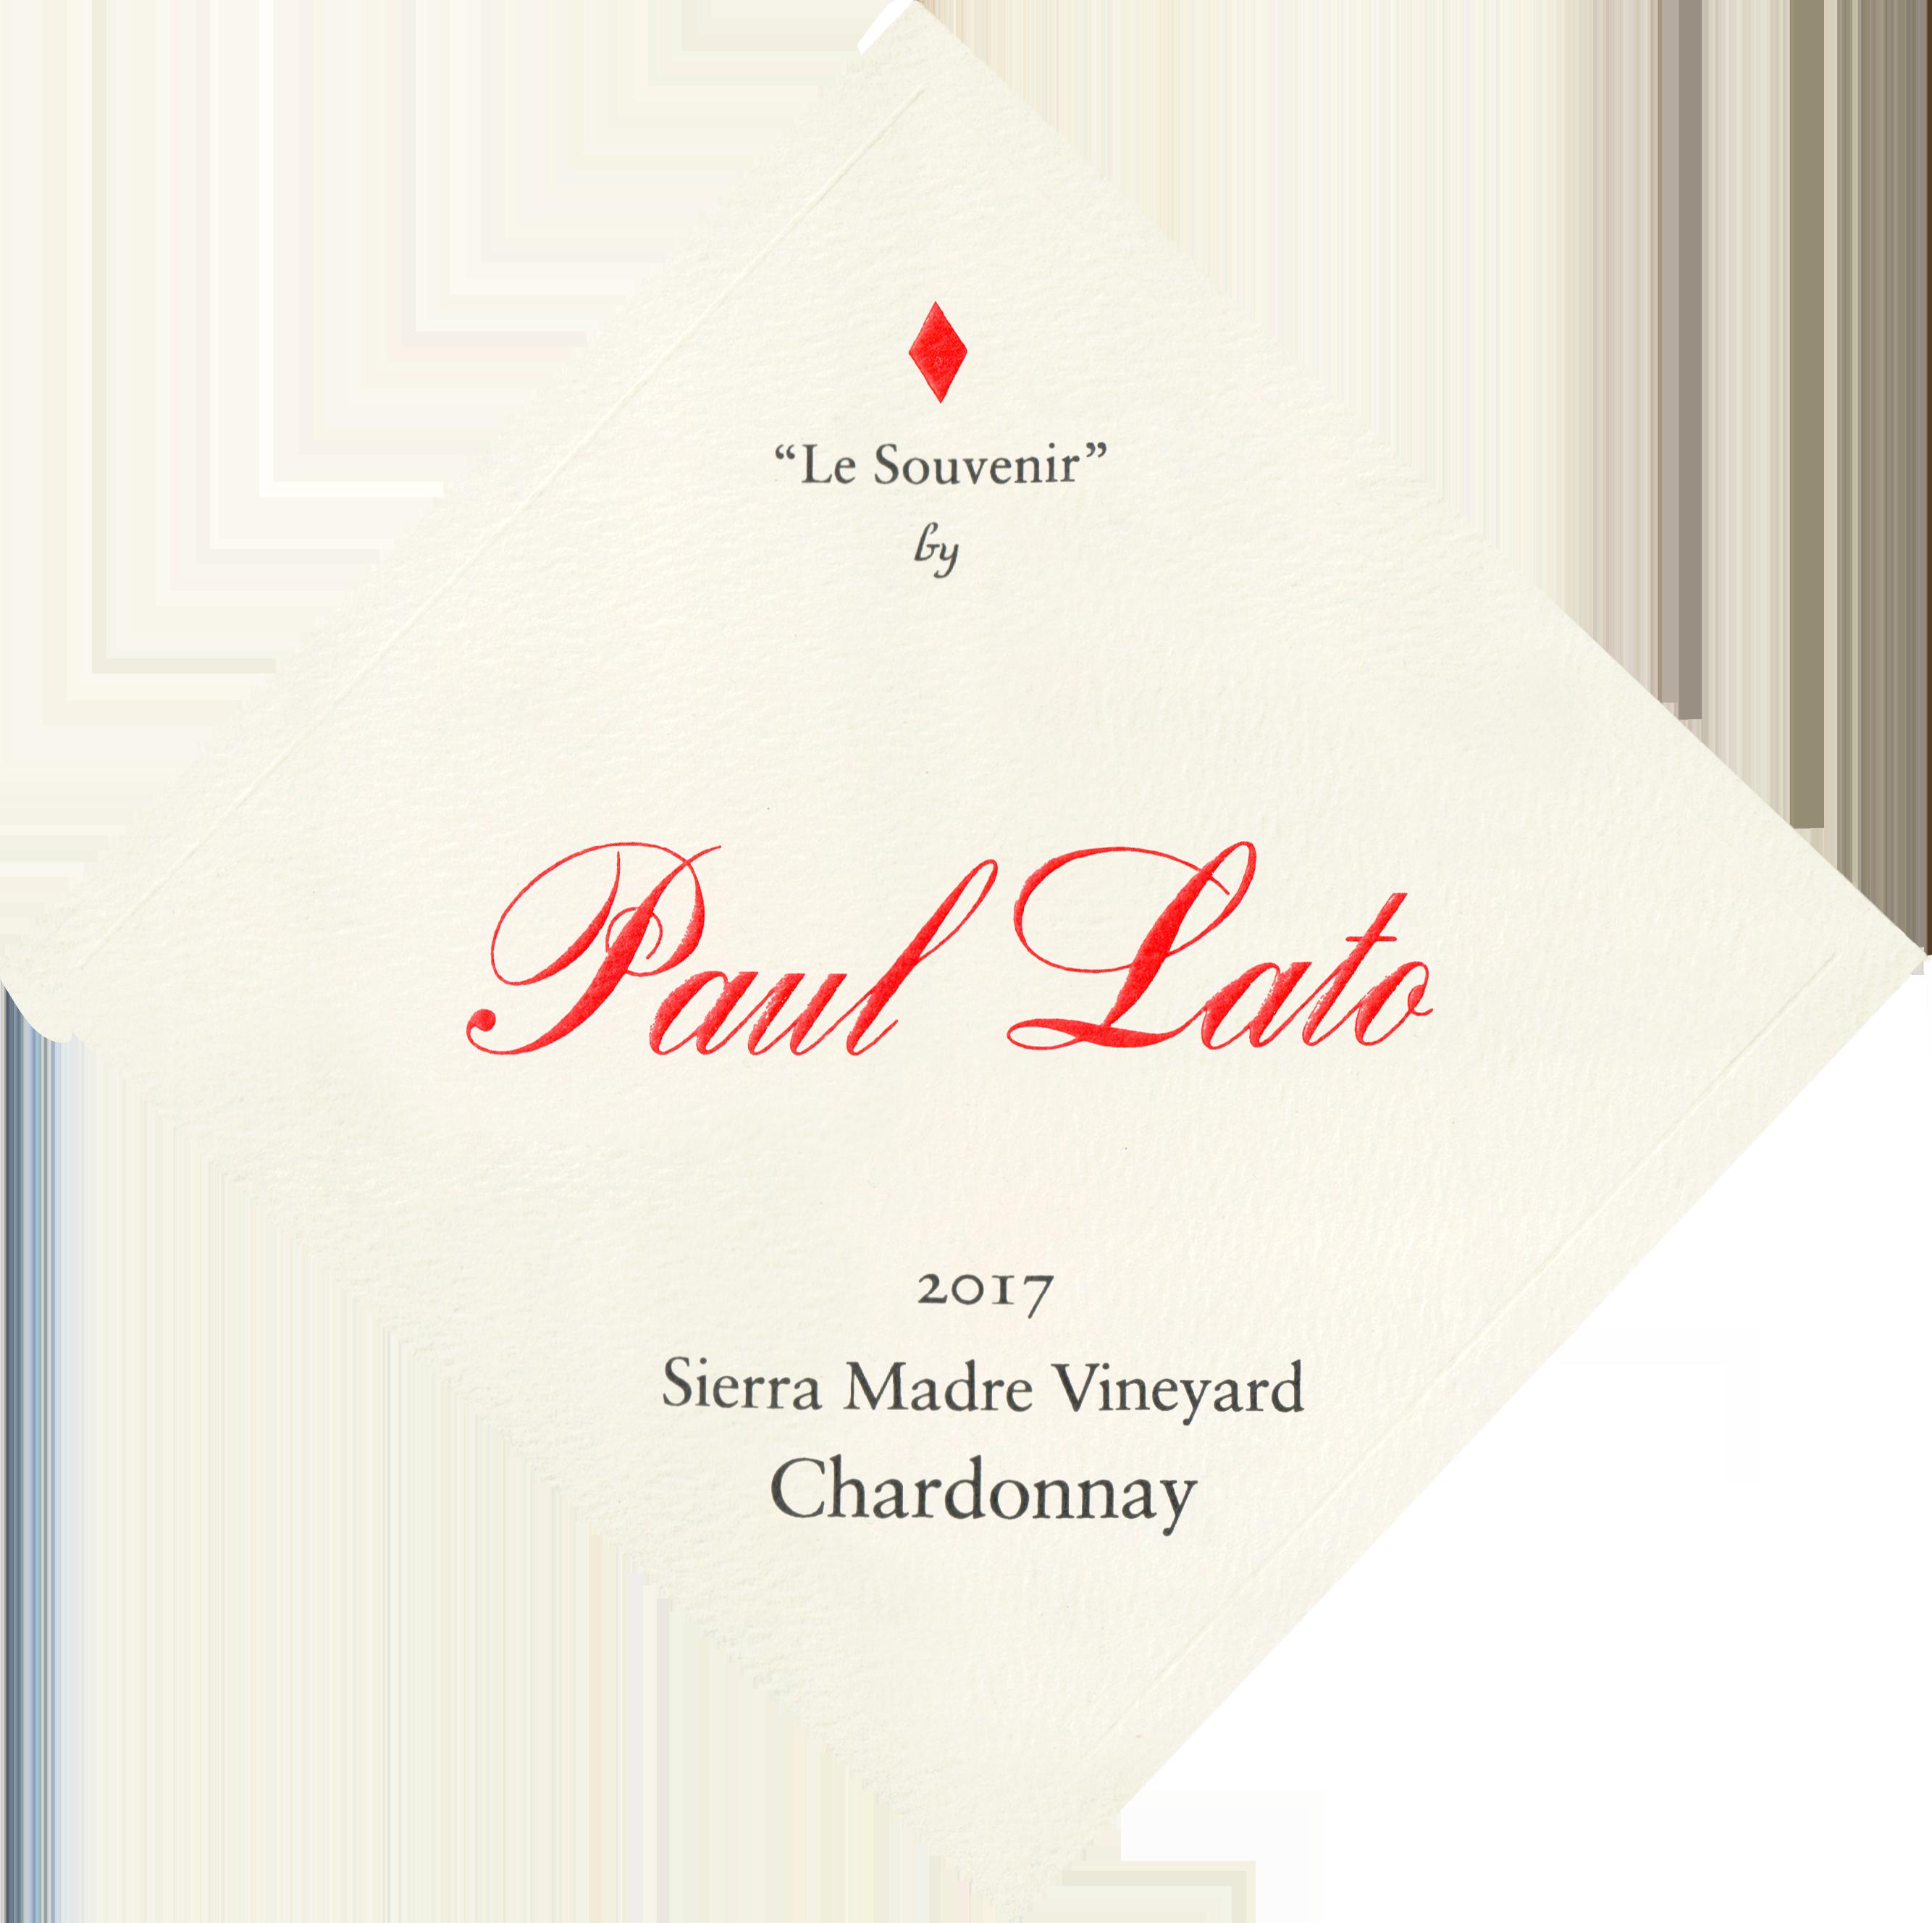 Paul Lato Le Souvenir Sierra Madre Vineyard Chardonnay 2017